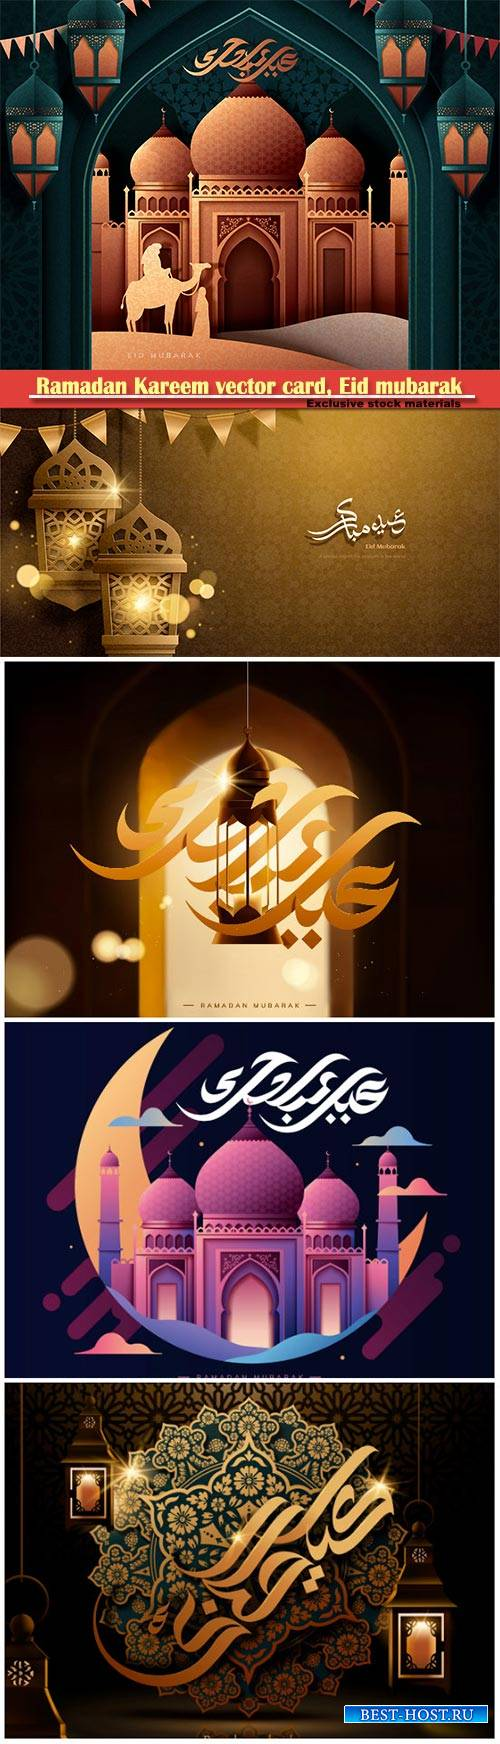 Ramadan Kareem vector card, Eid mubarak calligraphy design templates # 28